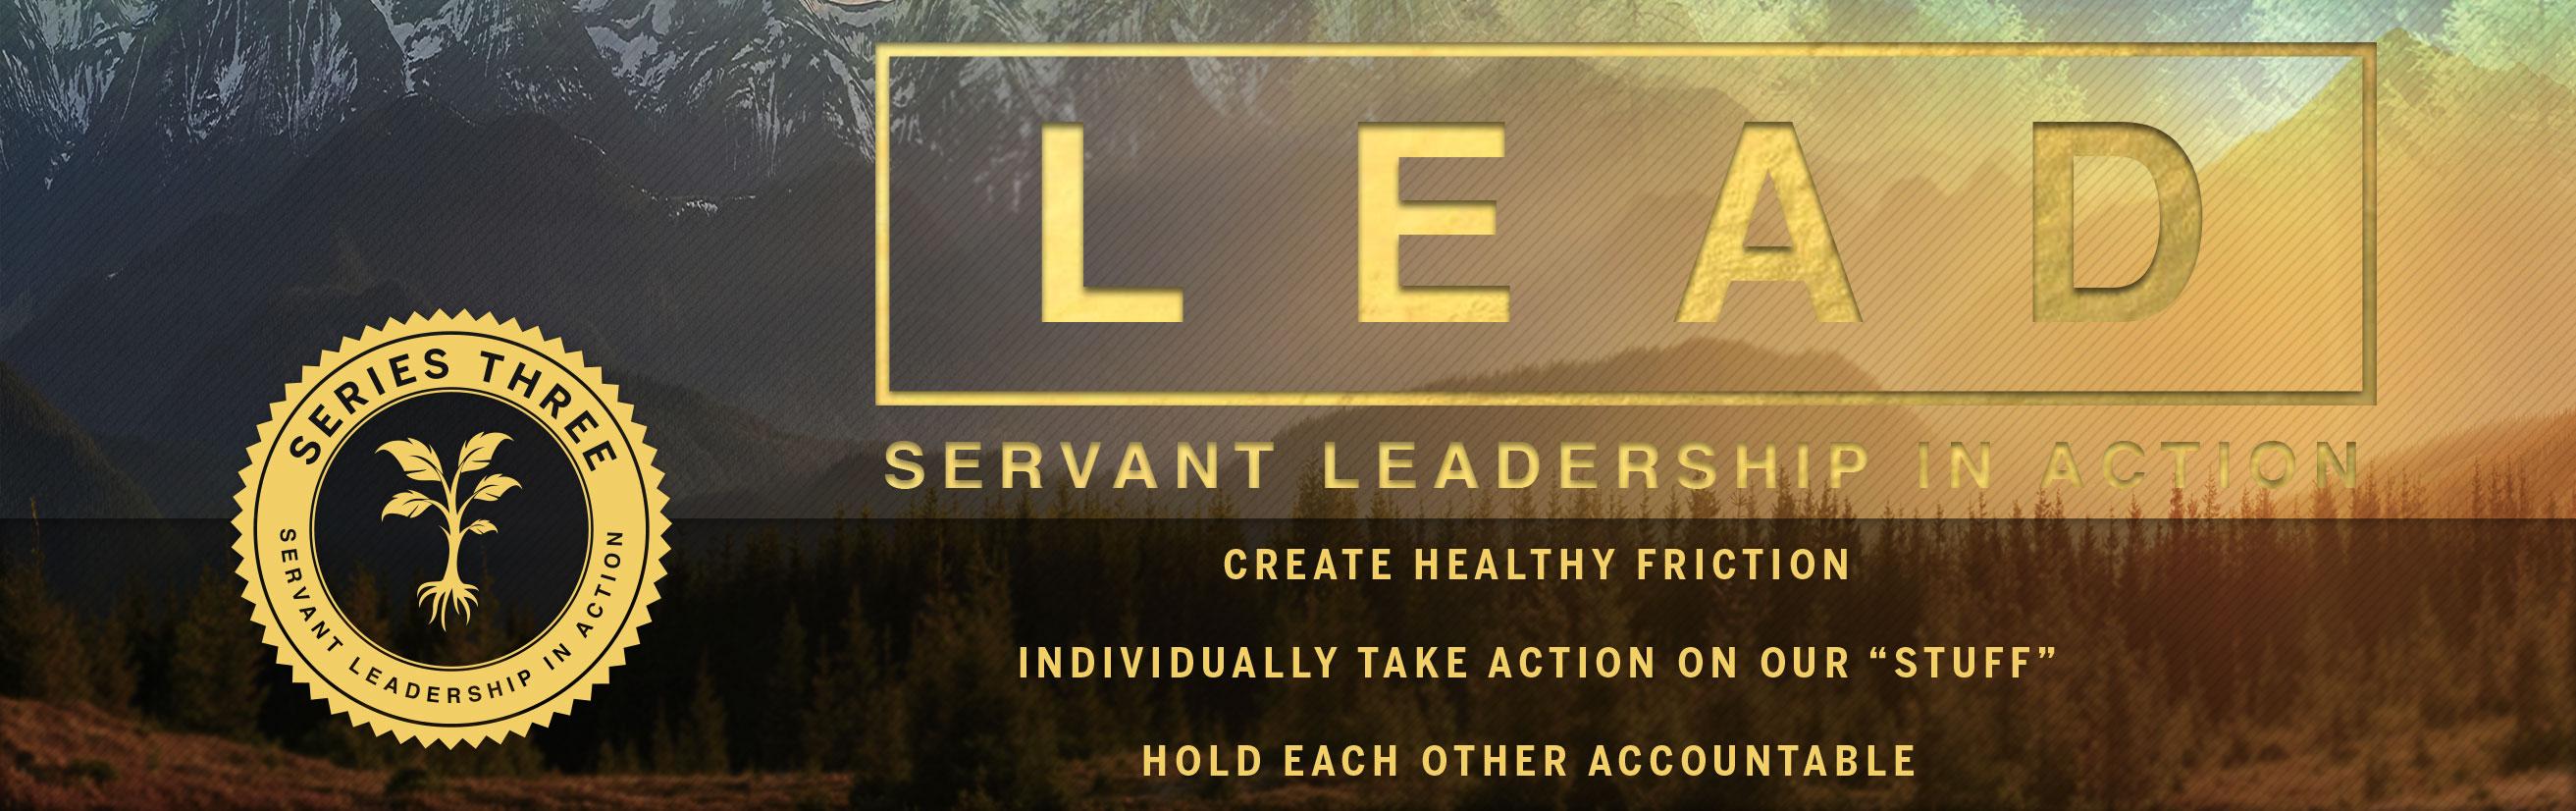 Lead - Servant Leadership in Action